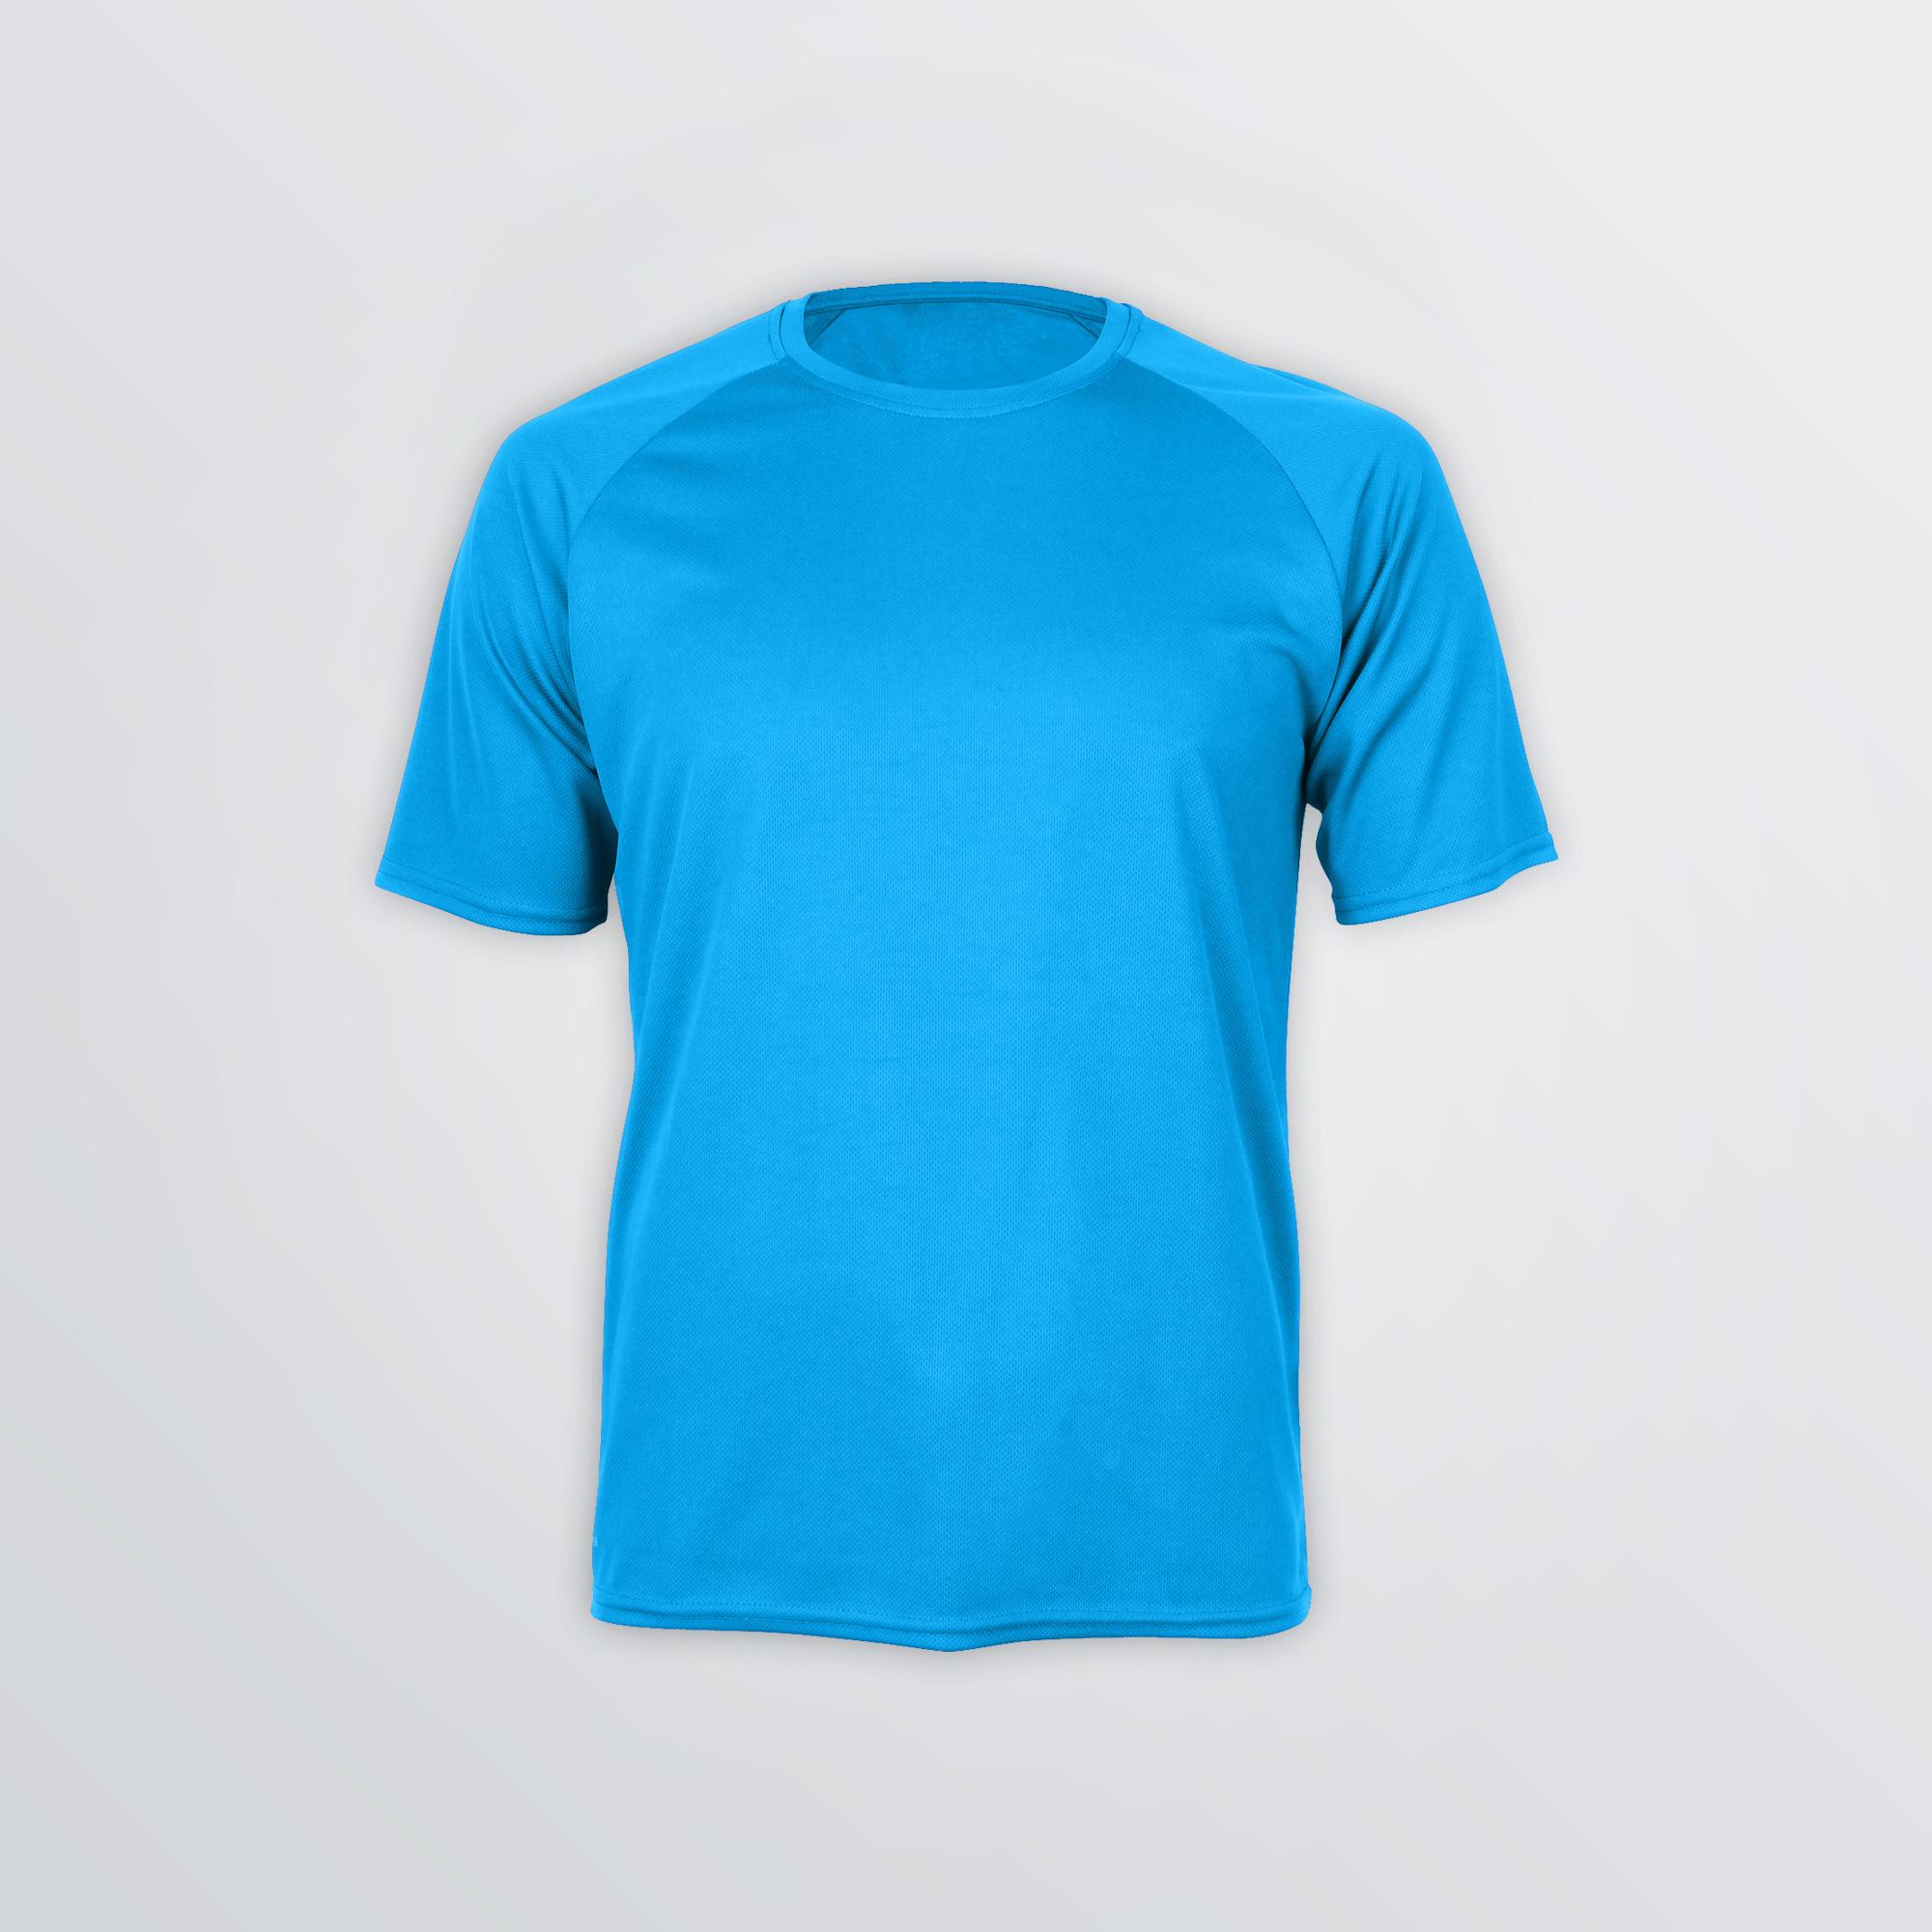 Basic_Tech_Shirt